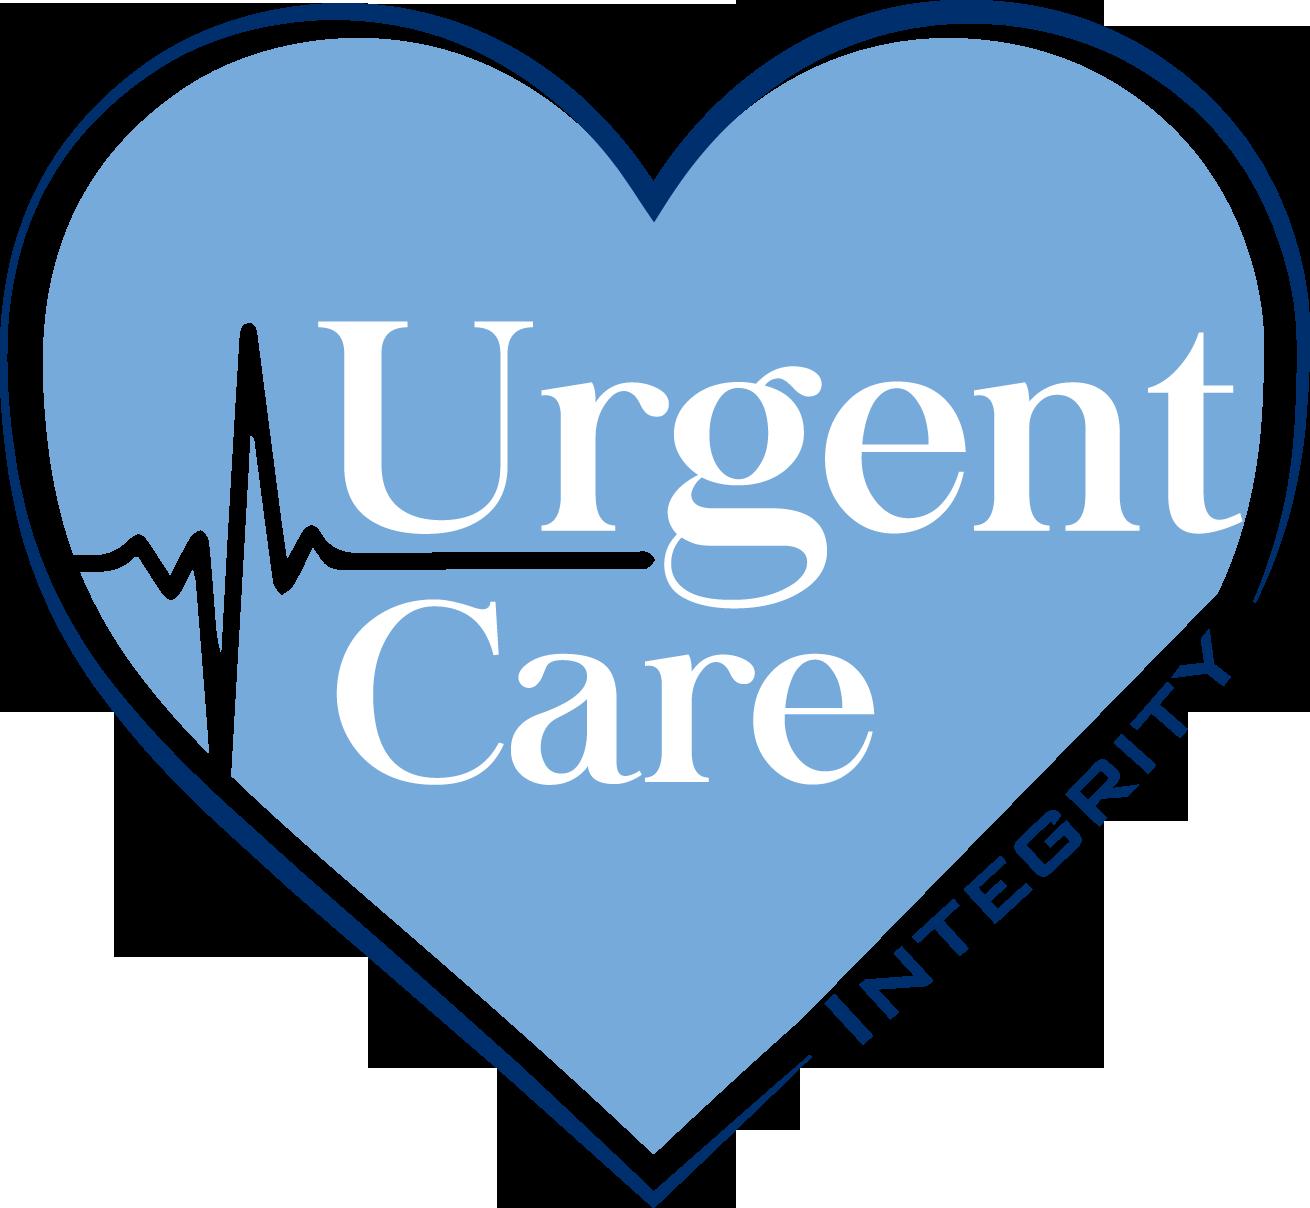 Integrity Urgent Care - Cleburne Logo